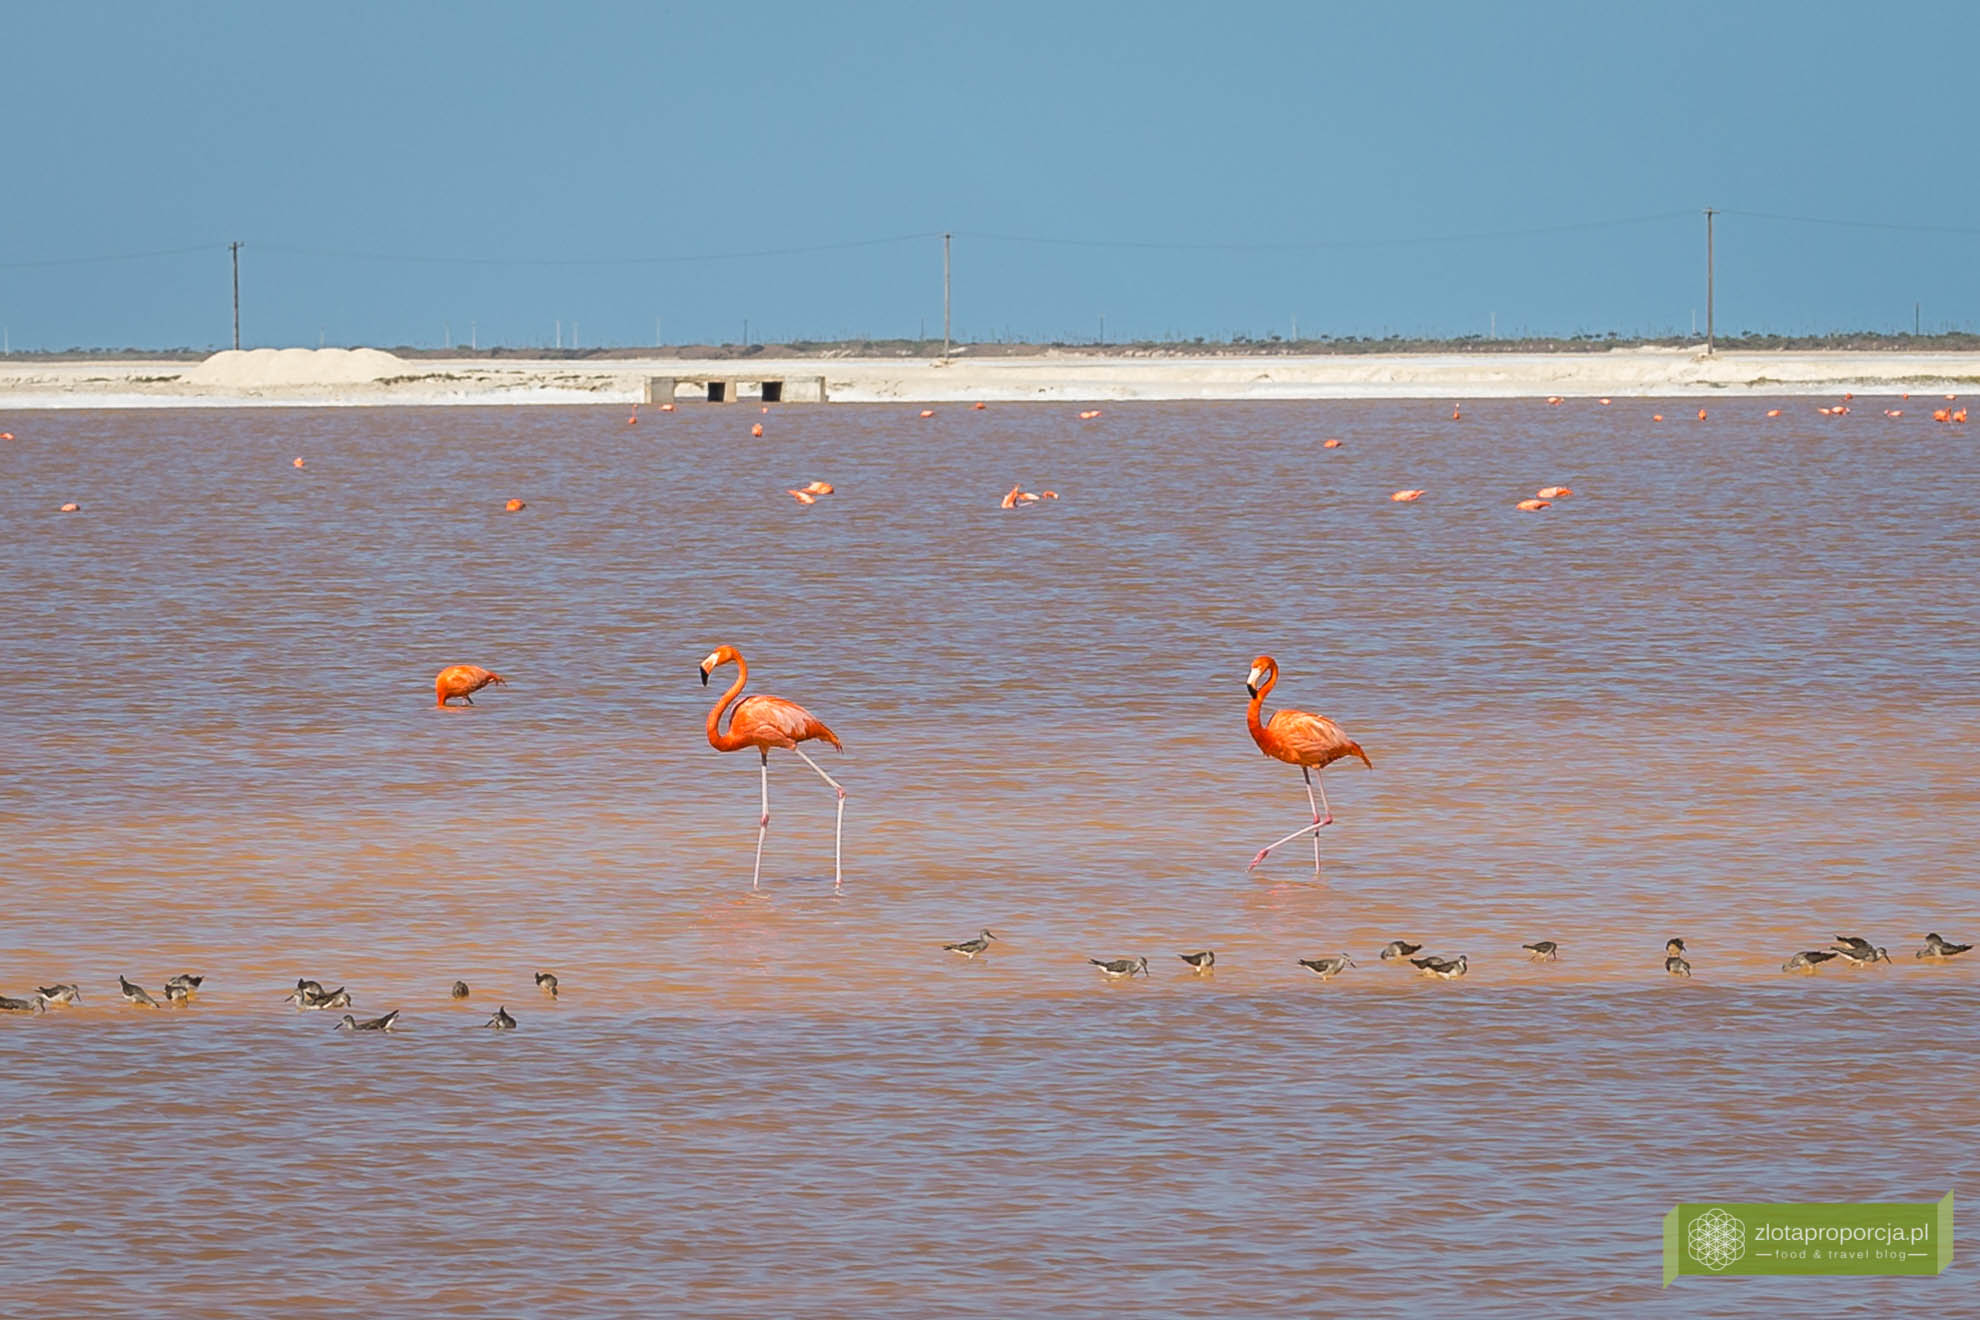 Rio Lagartos, Las Coloradas, różowa laguna w Meksyku, różowe jeziorka, Jukatan, atrakcje Jukatanu, co zobaczyć na Jukatanie; różowe flamingi